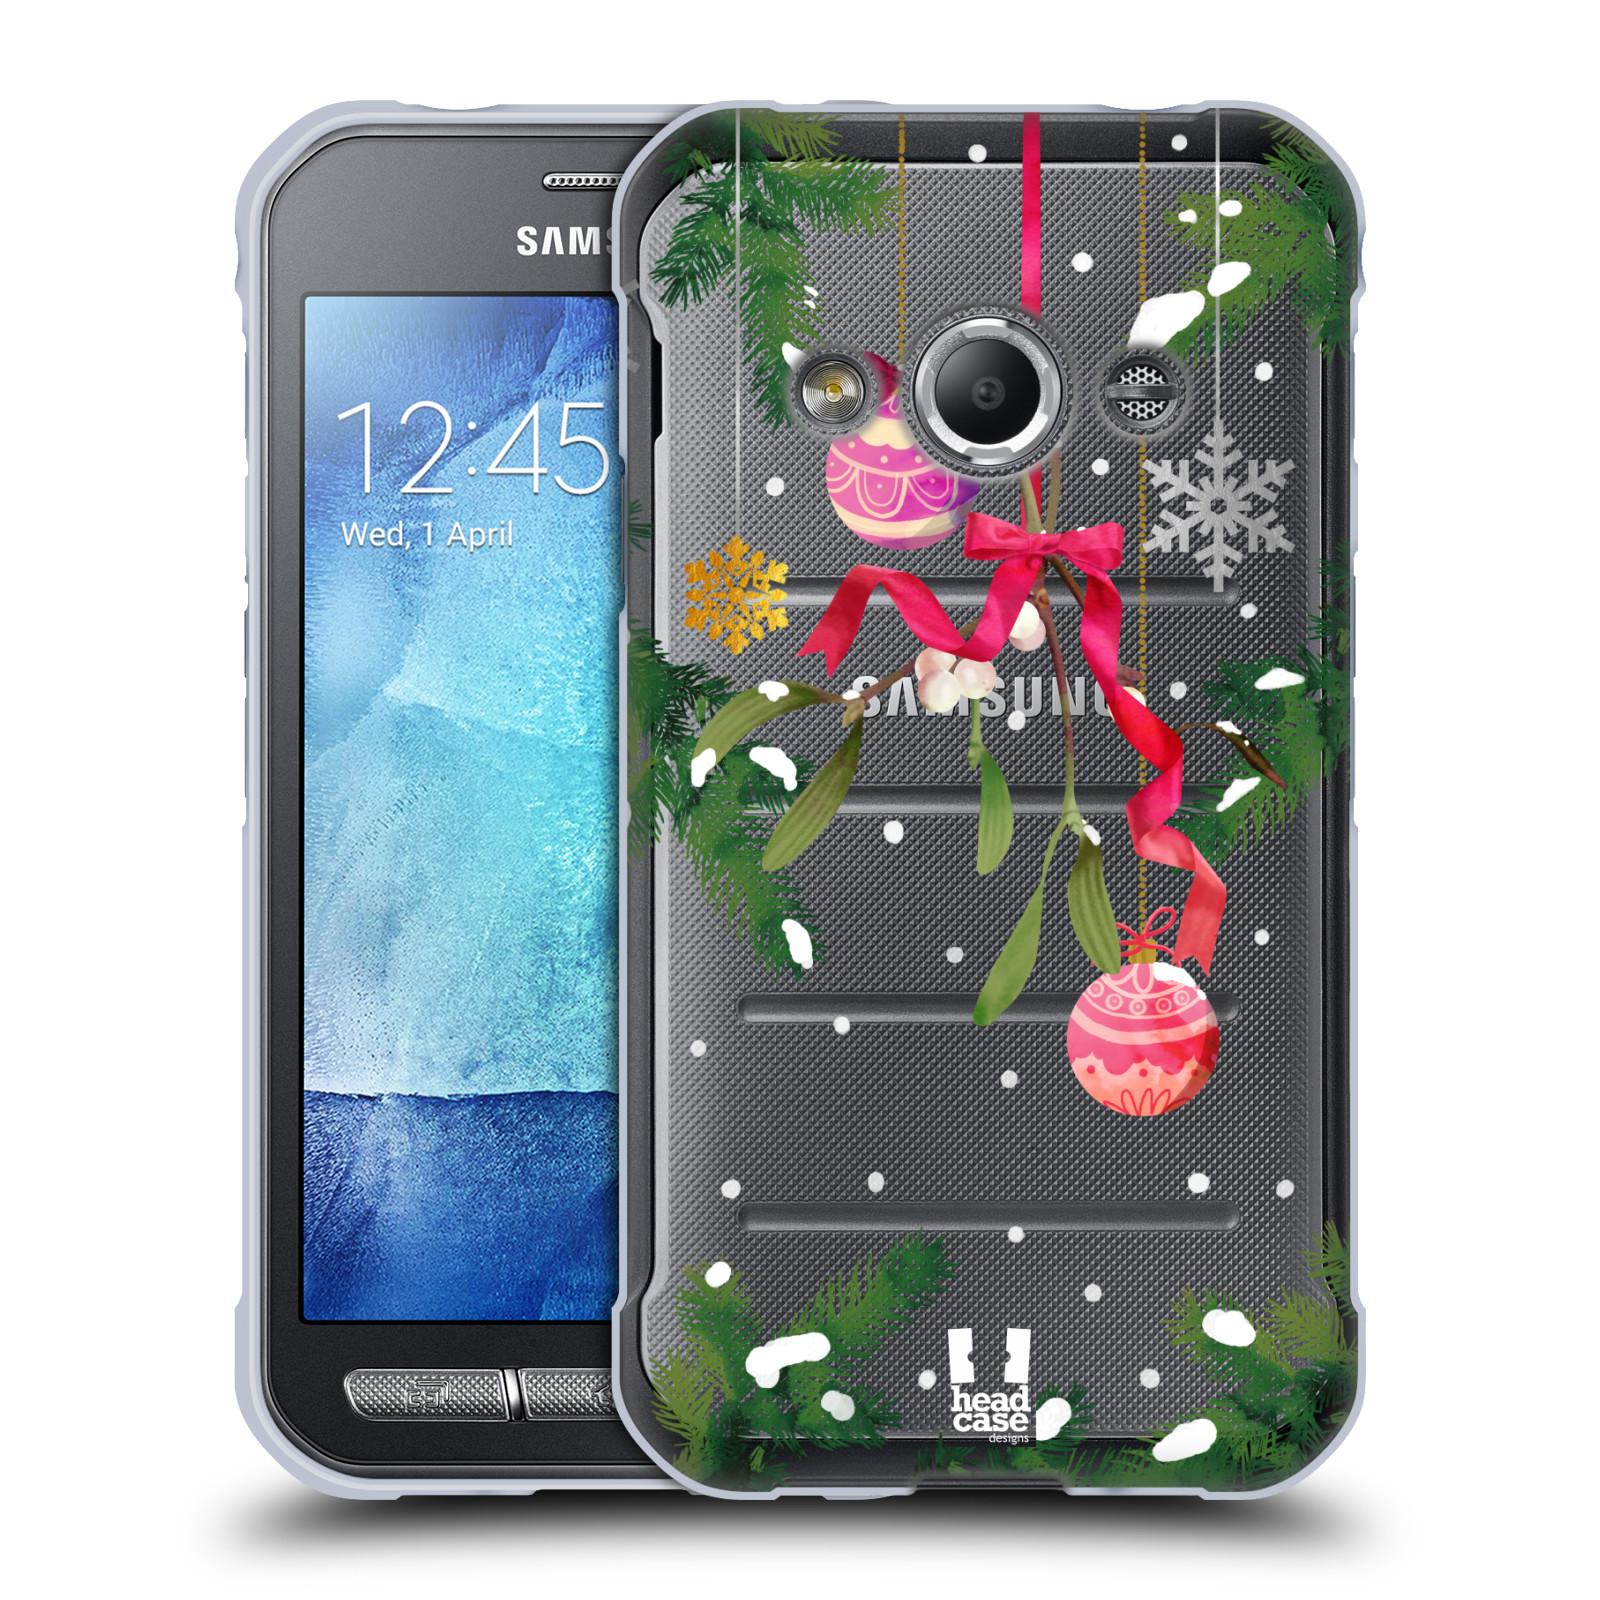 Silikonové pouzdro na mobil Samsung Galaxy Xcover 3 - Head Case - Větvičky a vánoční ozdoby